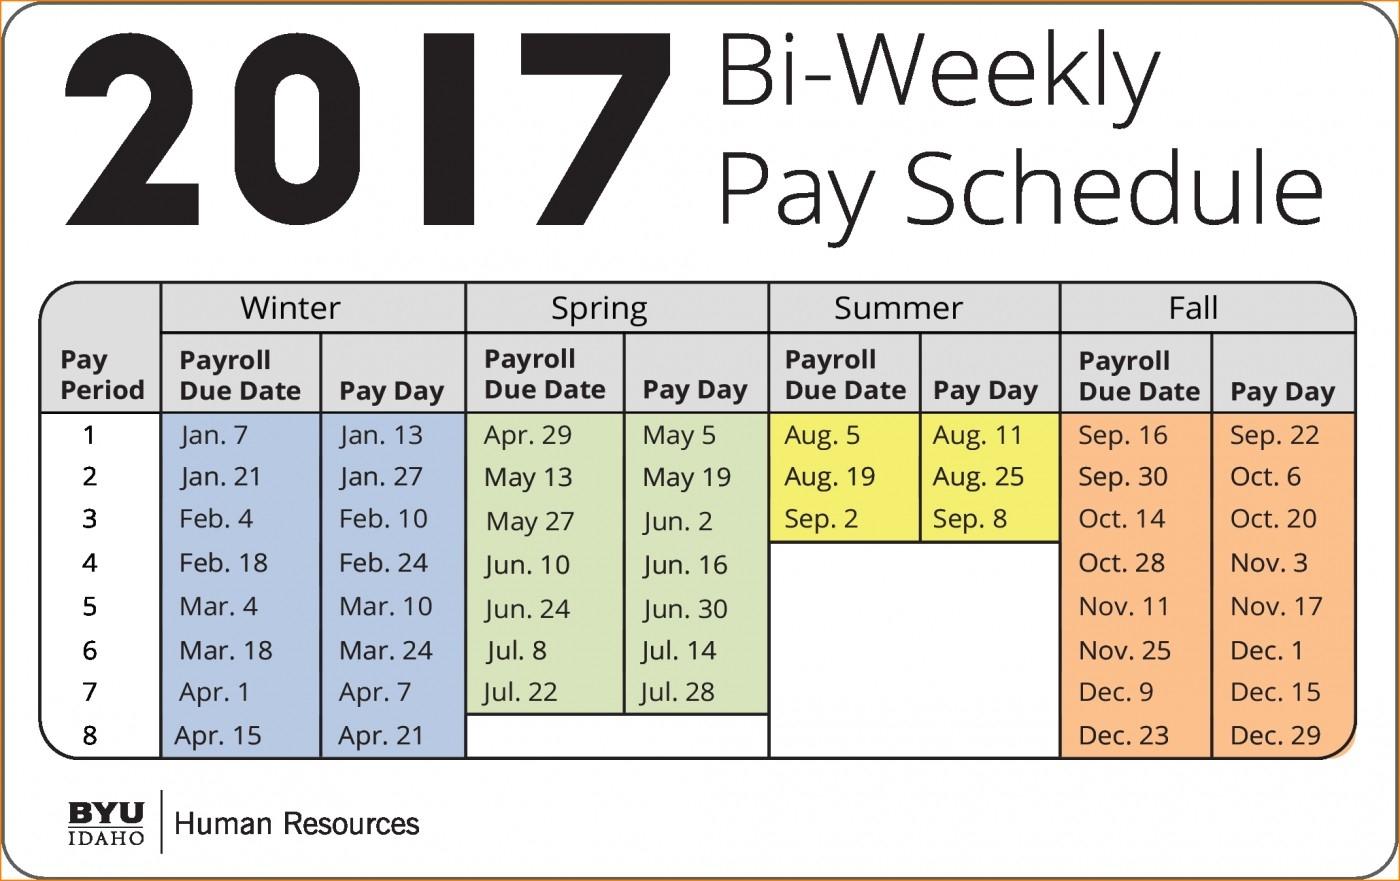 025 Bi Weekly Pay Calendar Template Payroll Calendars-Bi Weekly Pay Schedule 2020 Template